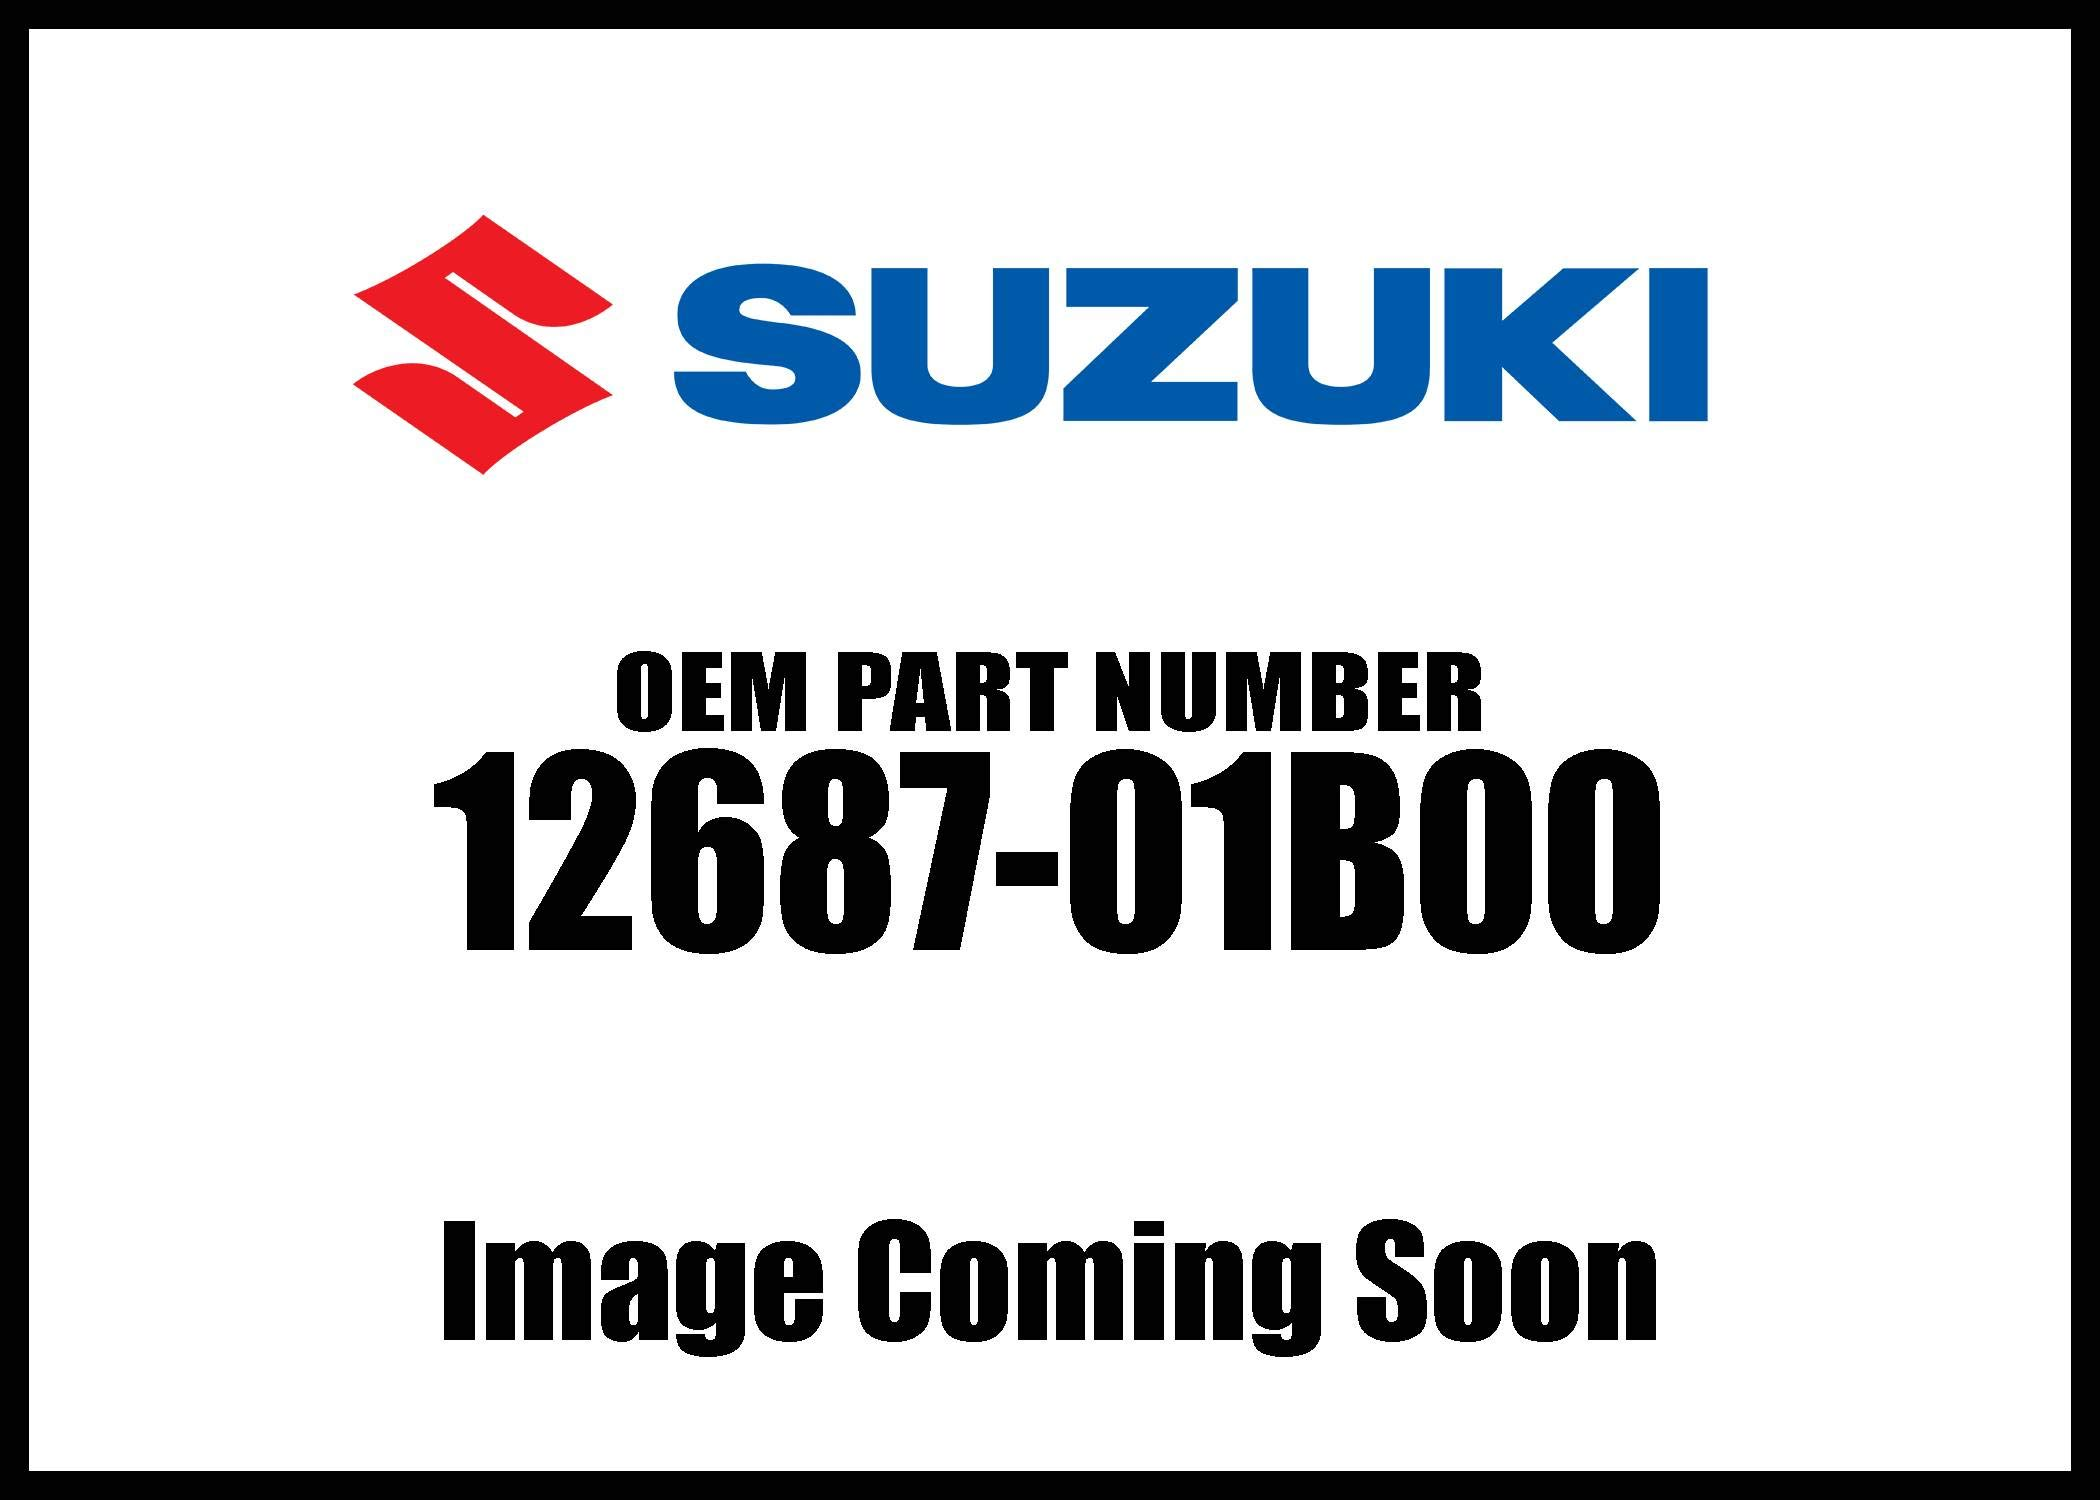 Suzuki Bush Exhaust Va 12687-01B00 New Oem